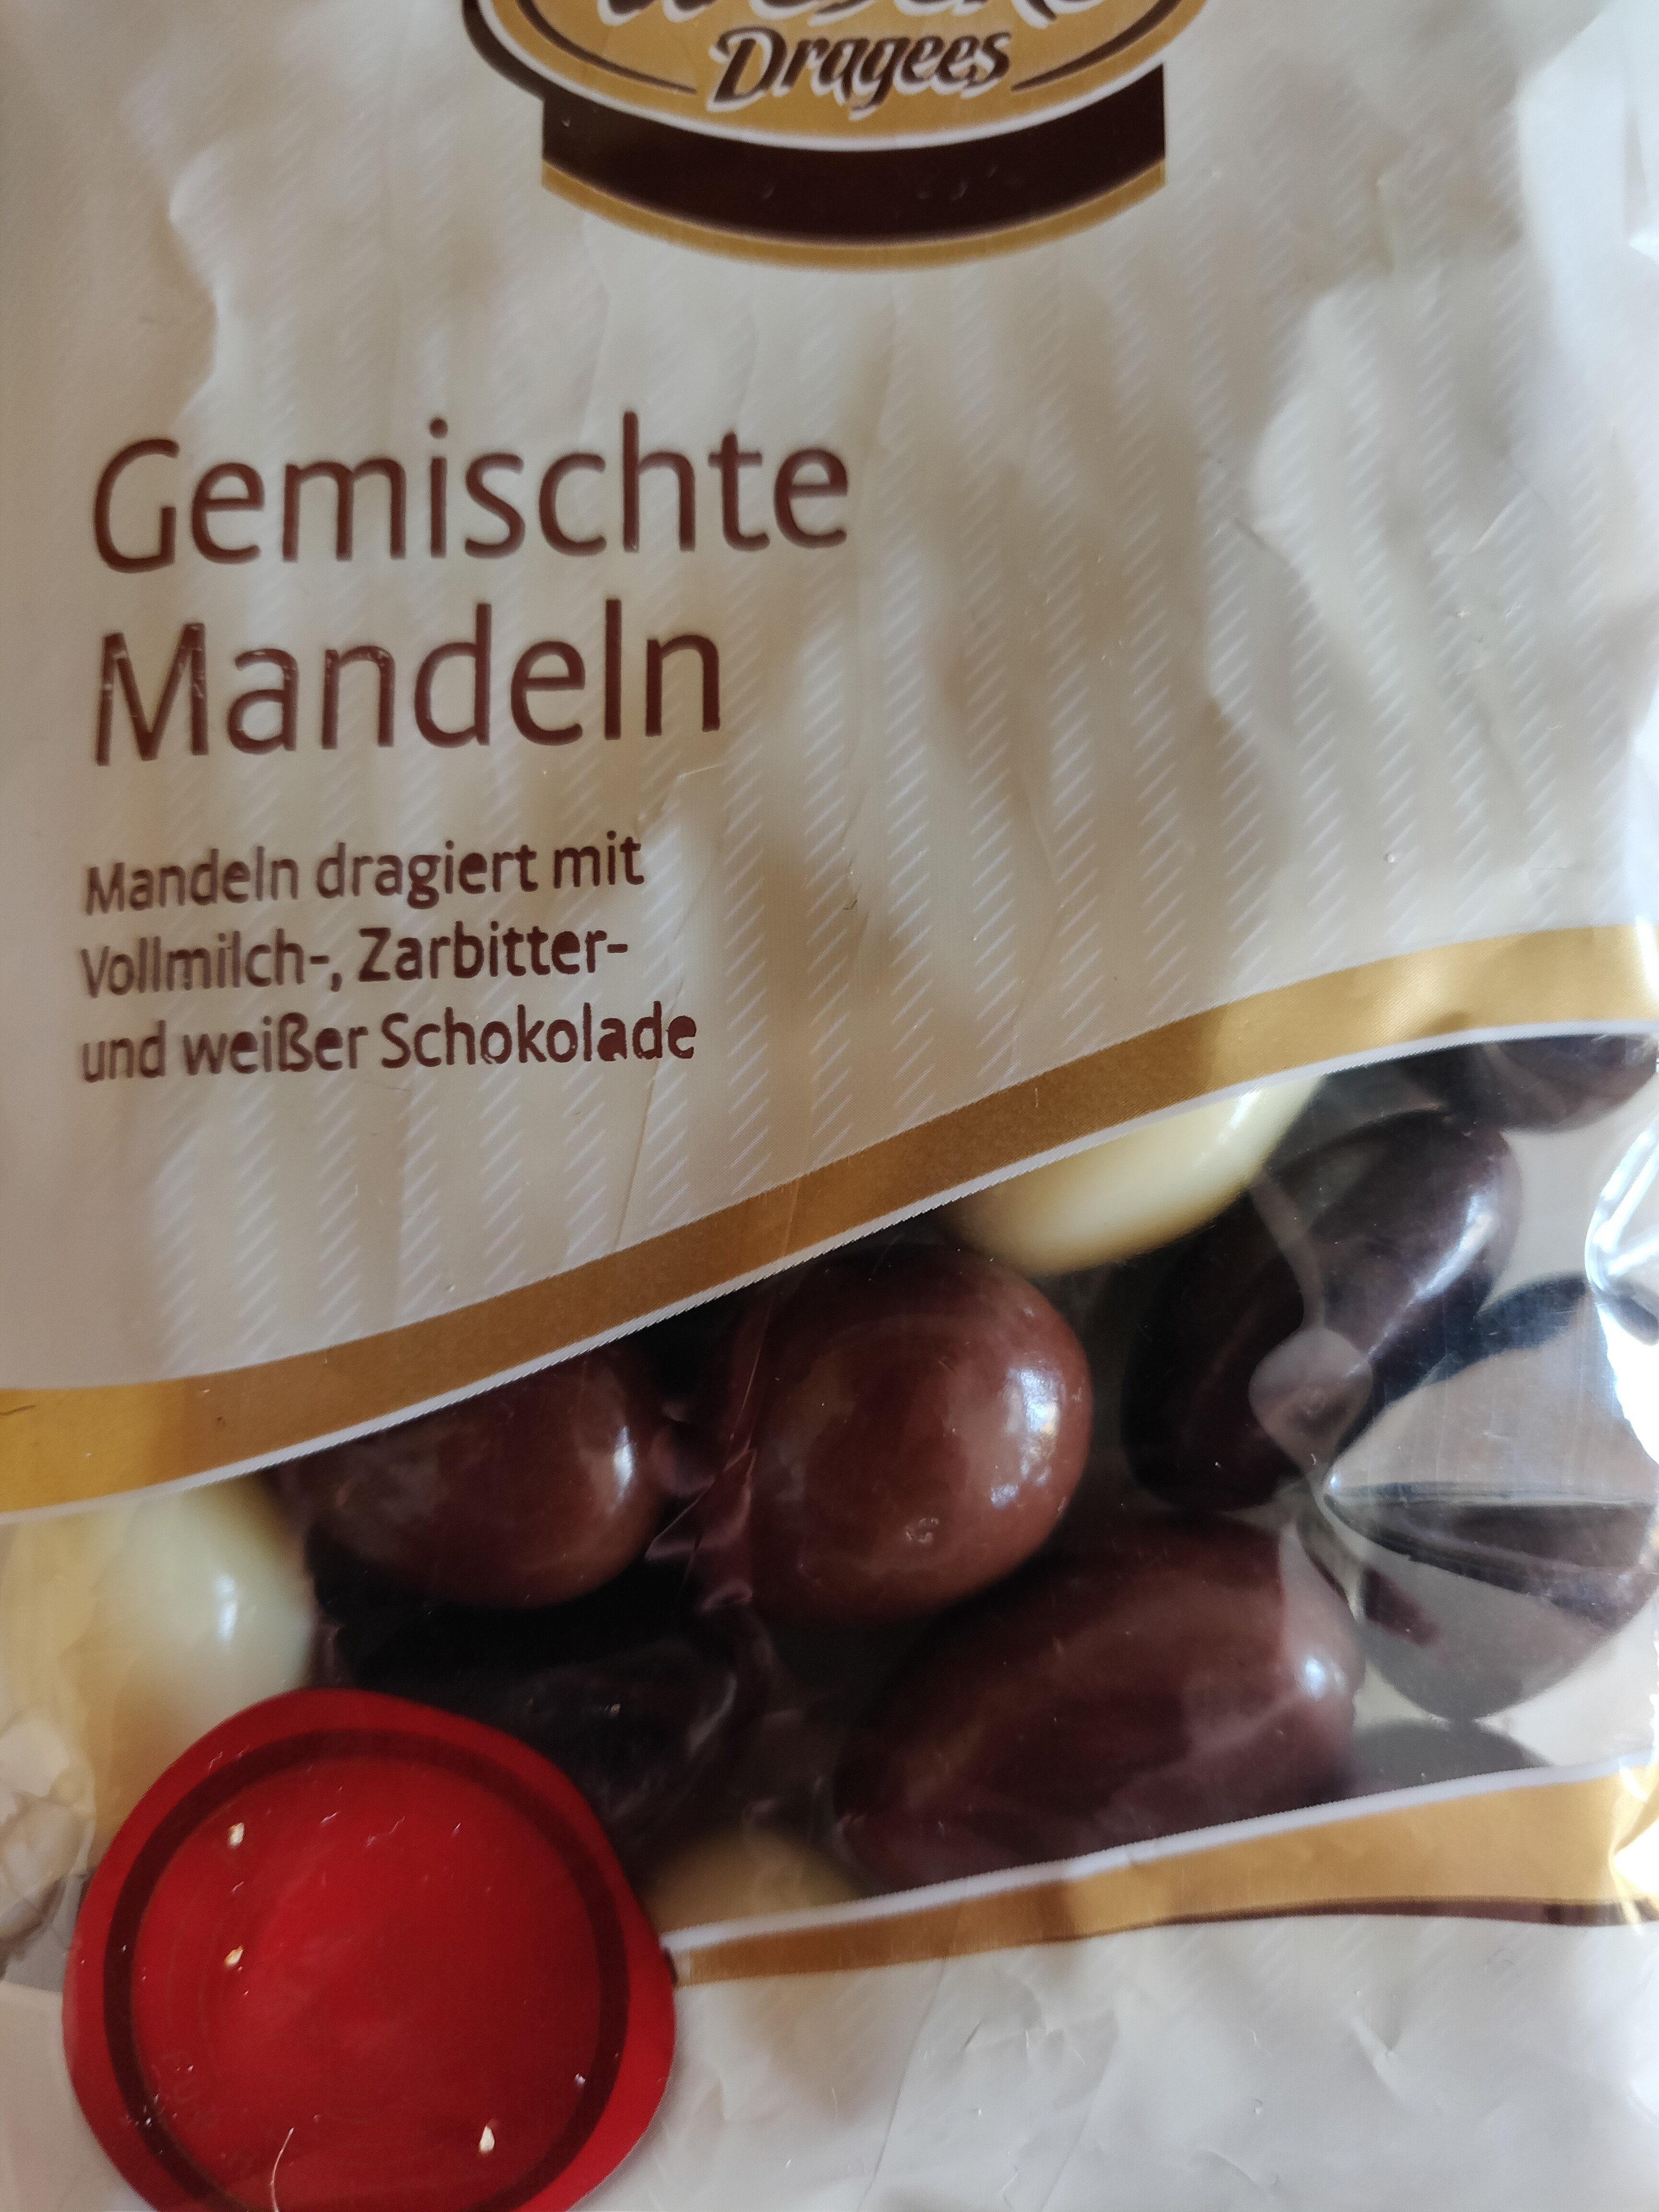 Gemischte Mandeln - Produit - de